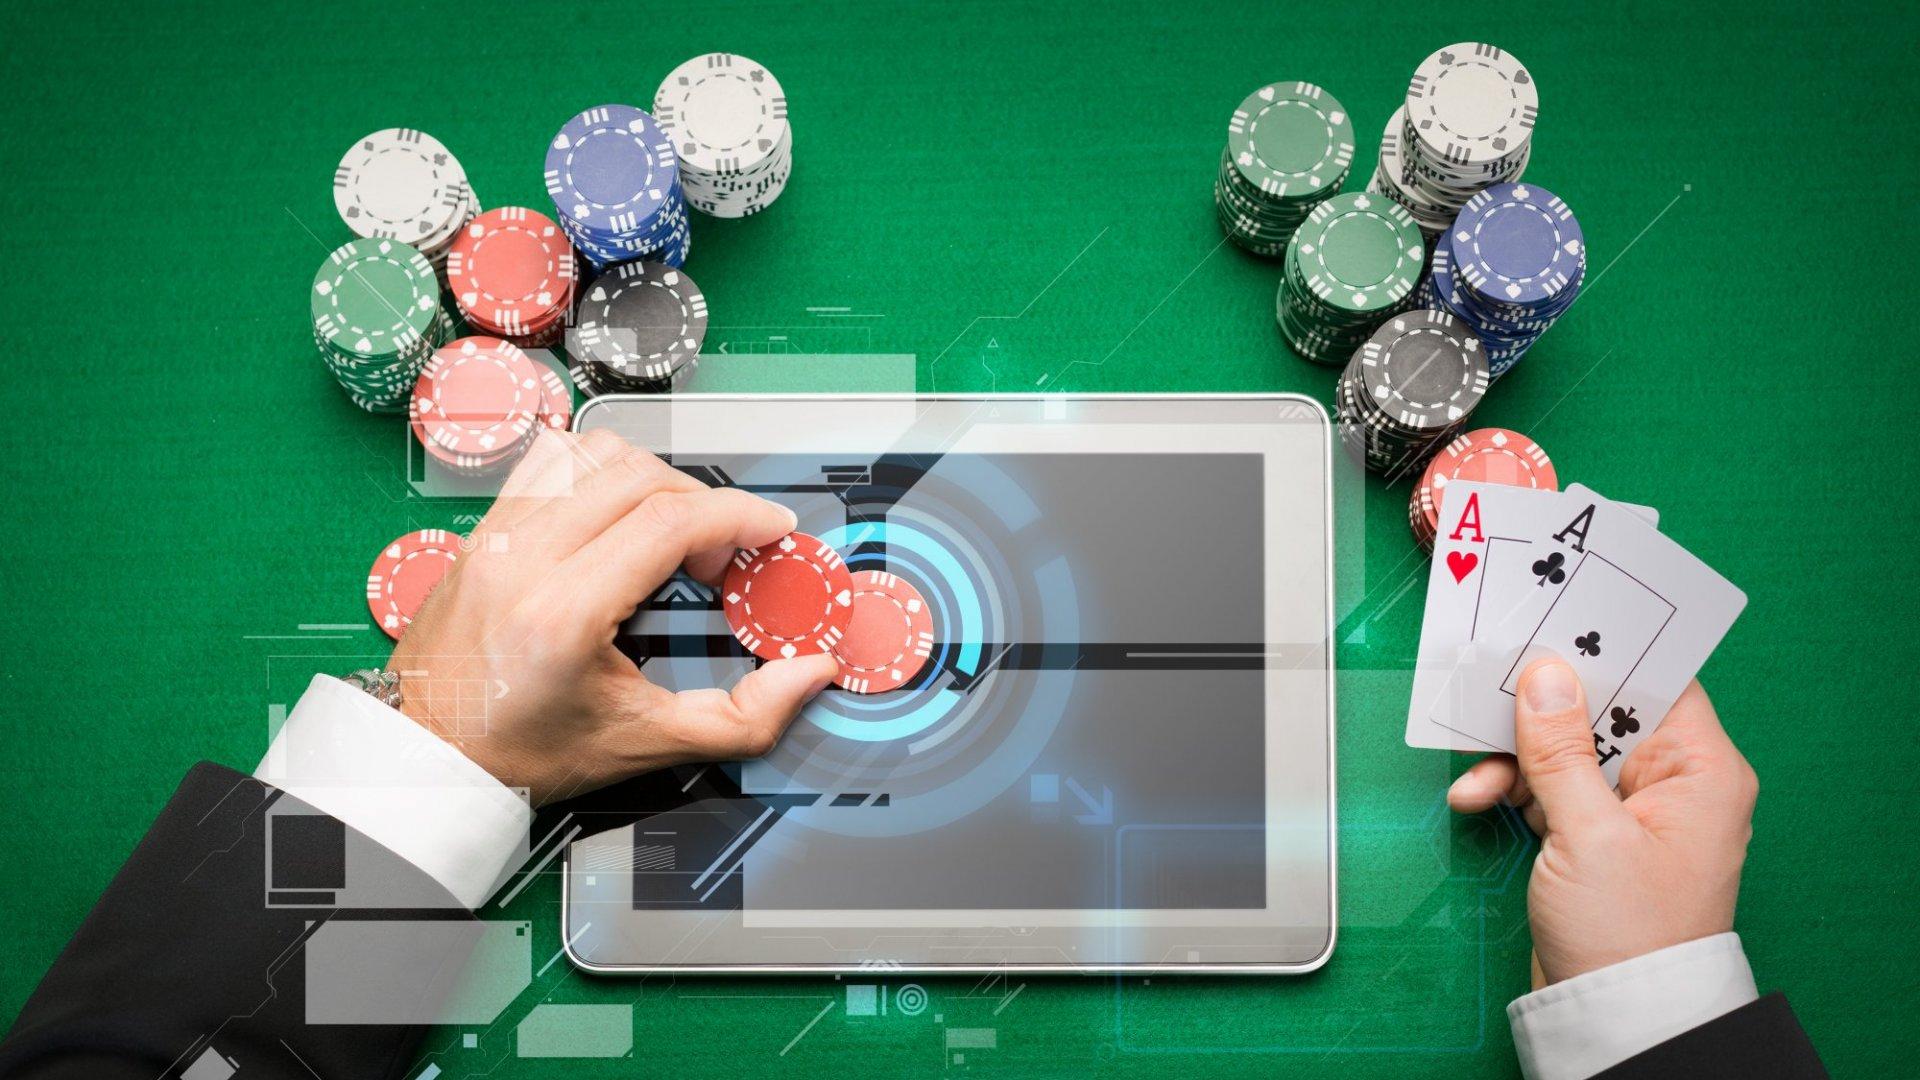 The Indian Online Gambling Market Statistics